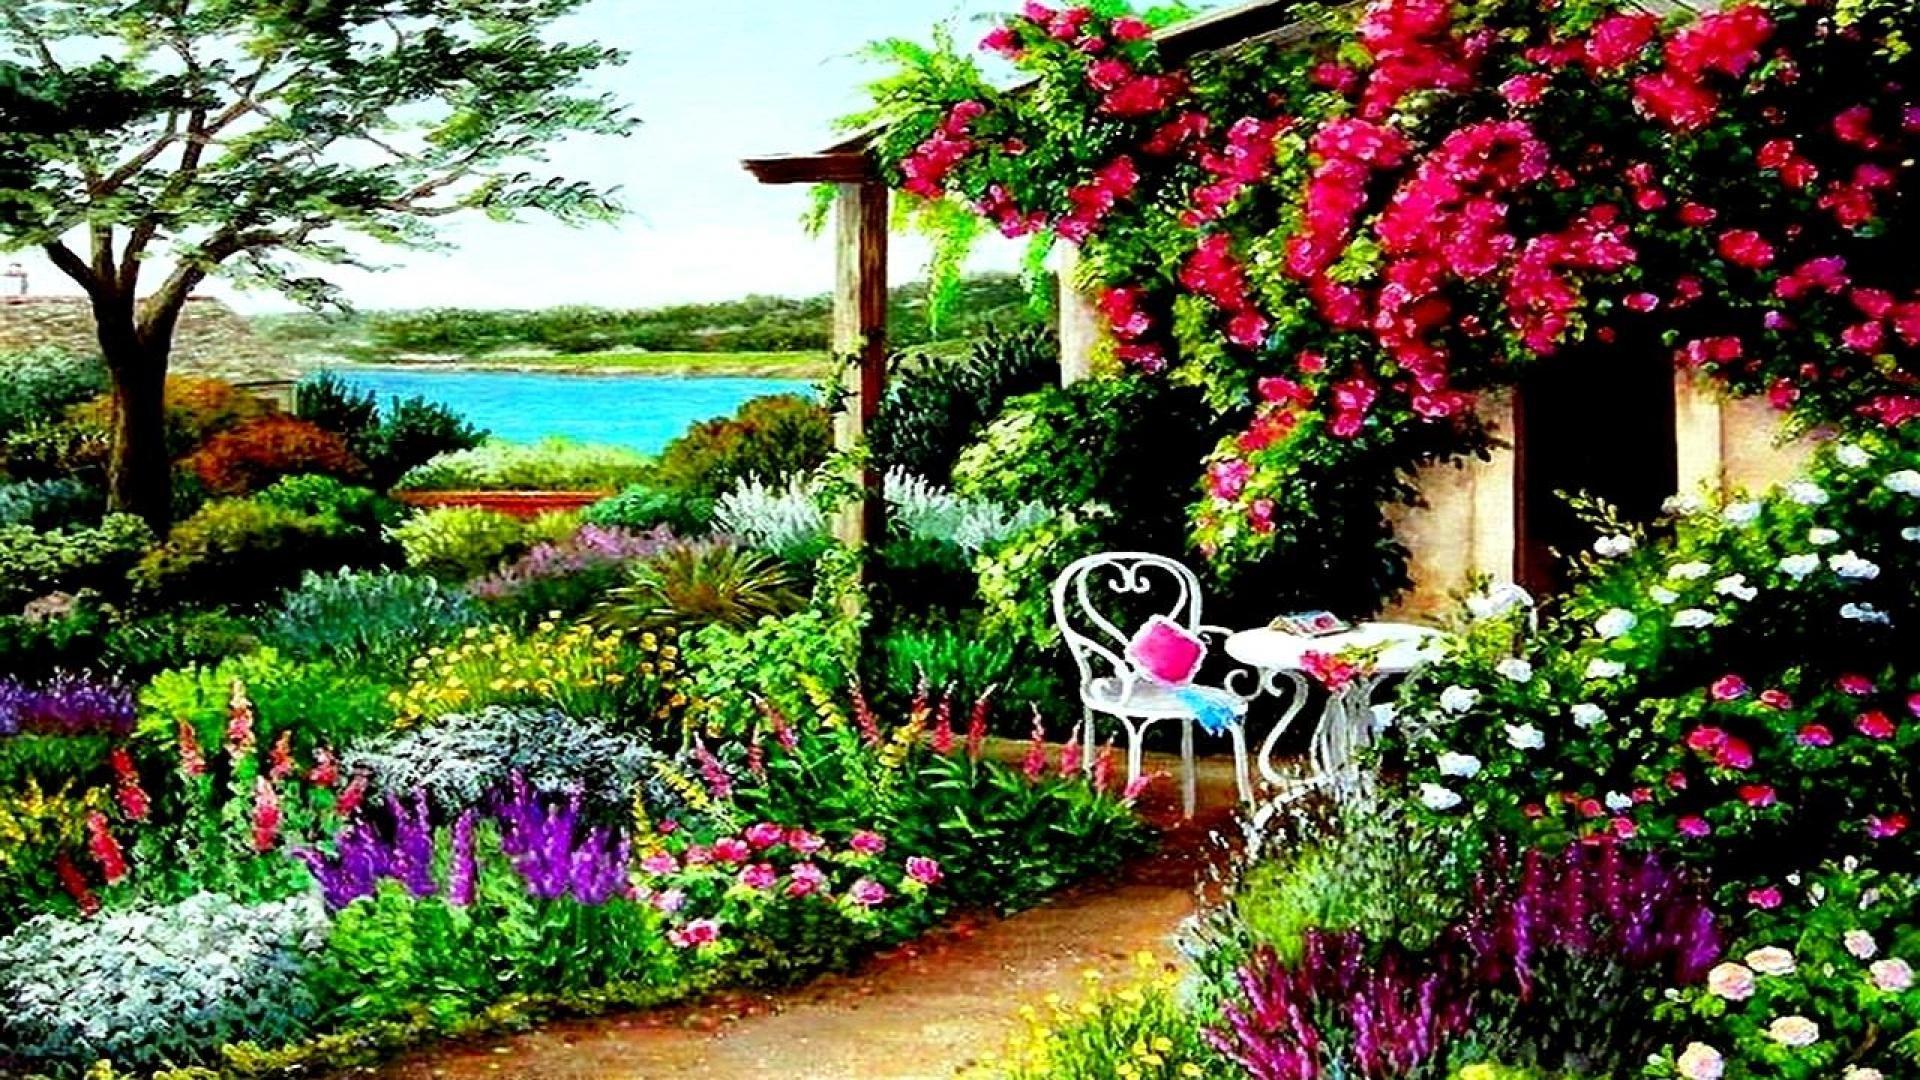 Spring garden wallpaper wallpapertag - Free computer backgrounds for spring ...